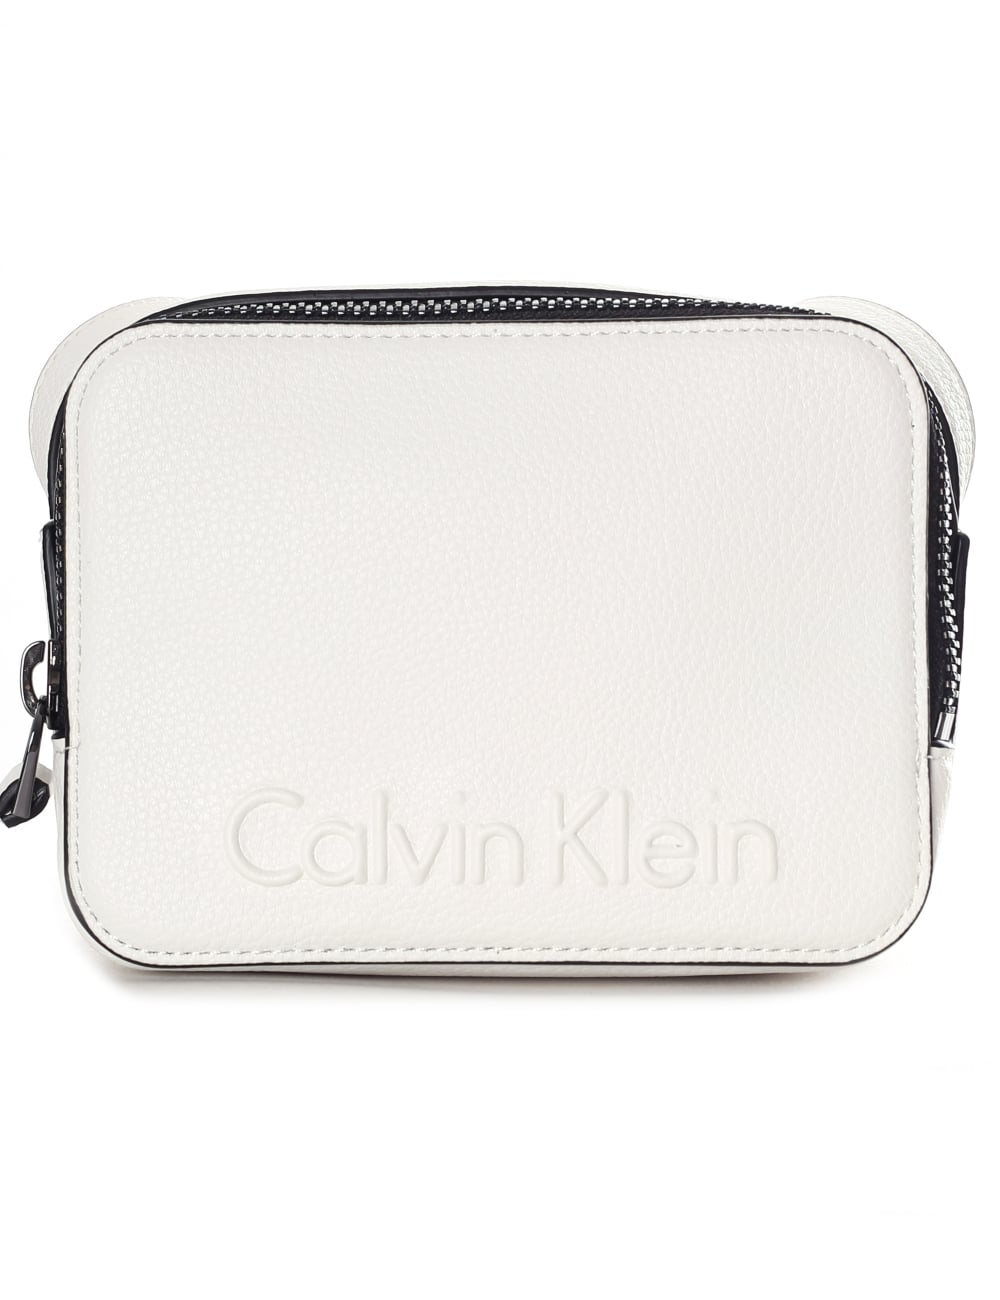 30d80d153 Calvin Klein Women's Embossed Small Crossbody Bag